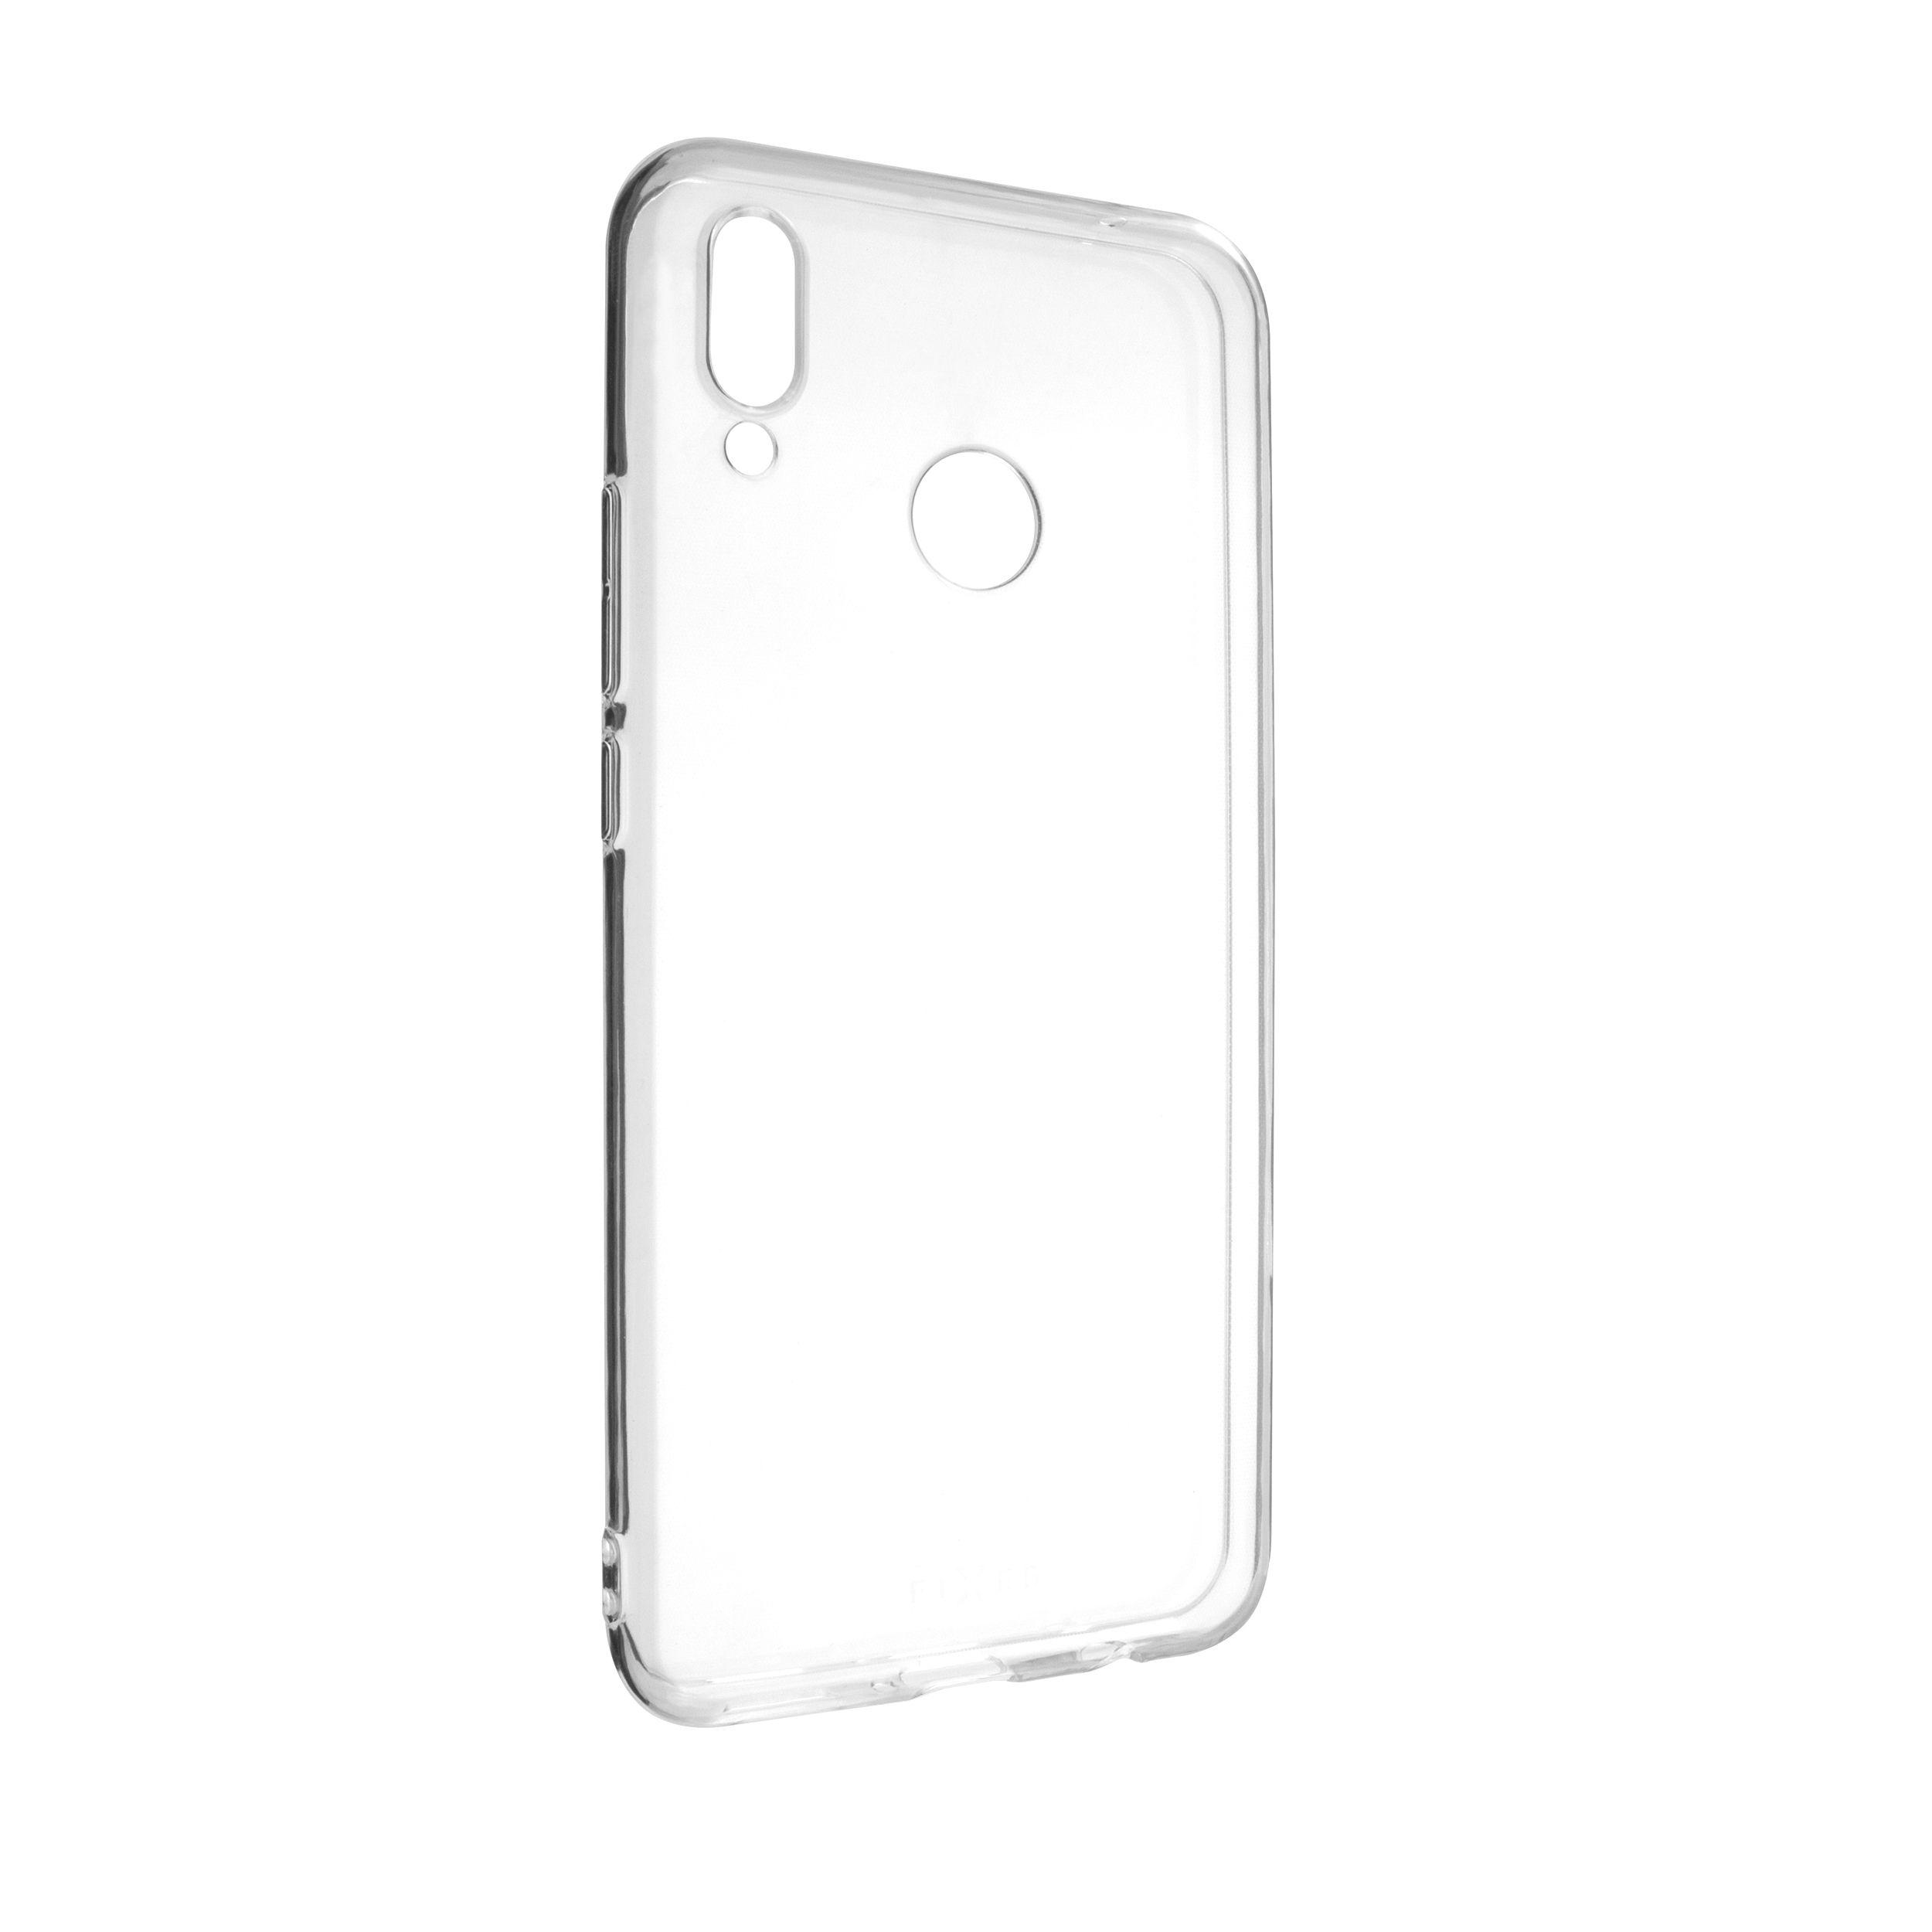 Ultratenké TPU gelové pouzdro FIXED Skin pro Huawei Nova 3i, 0,6 mm, čiré